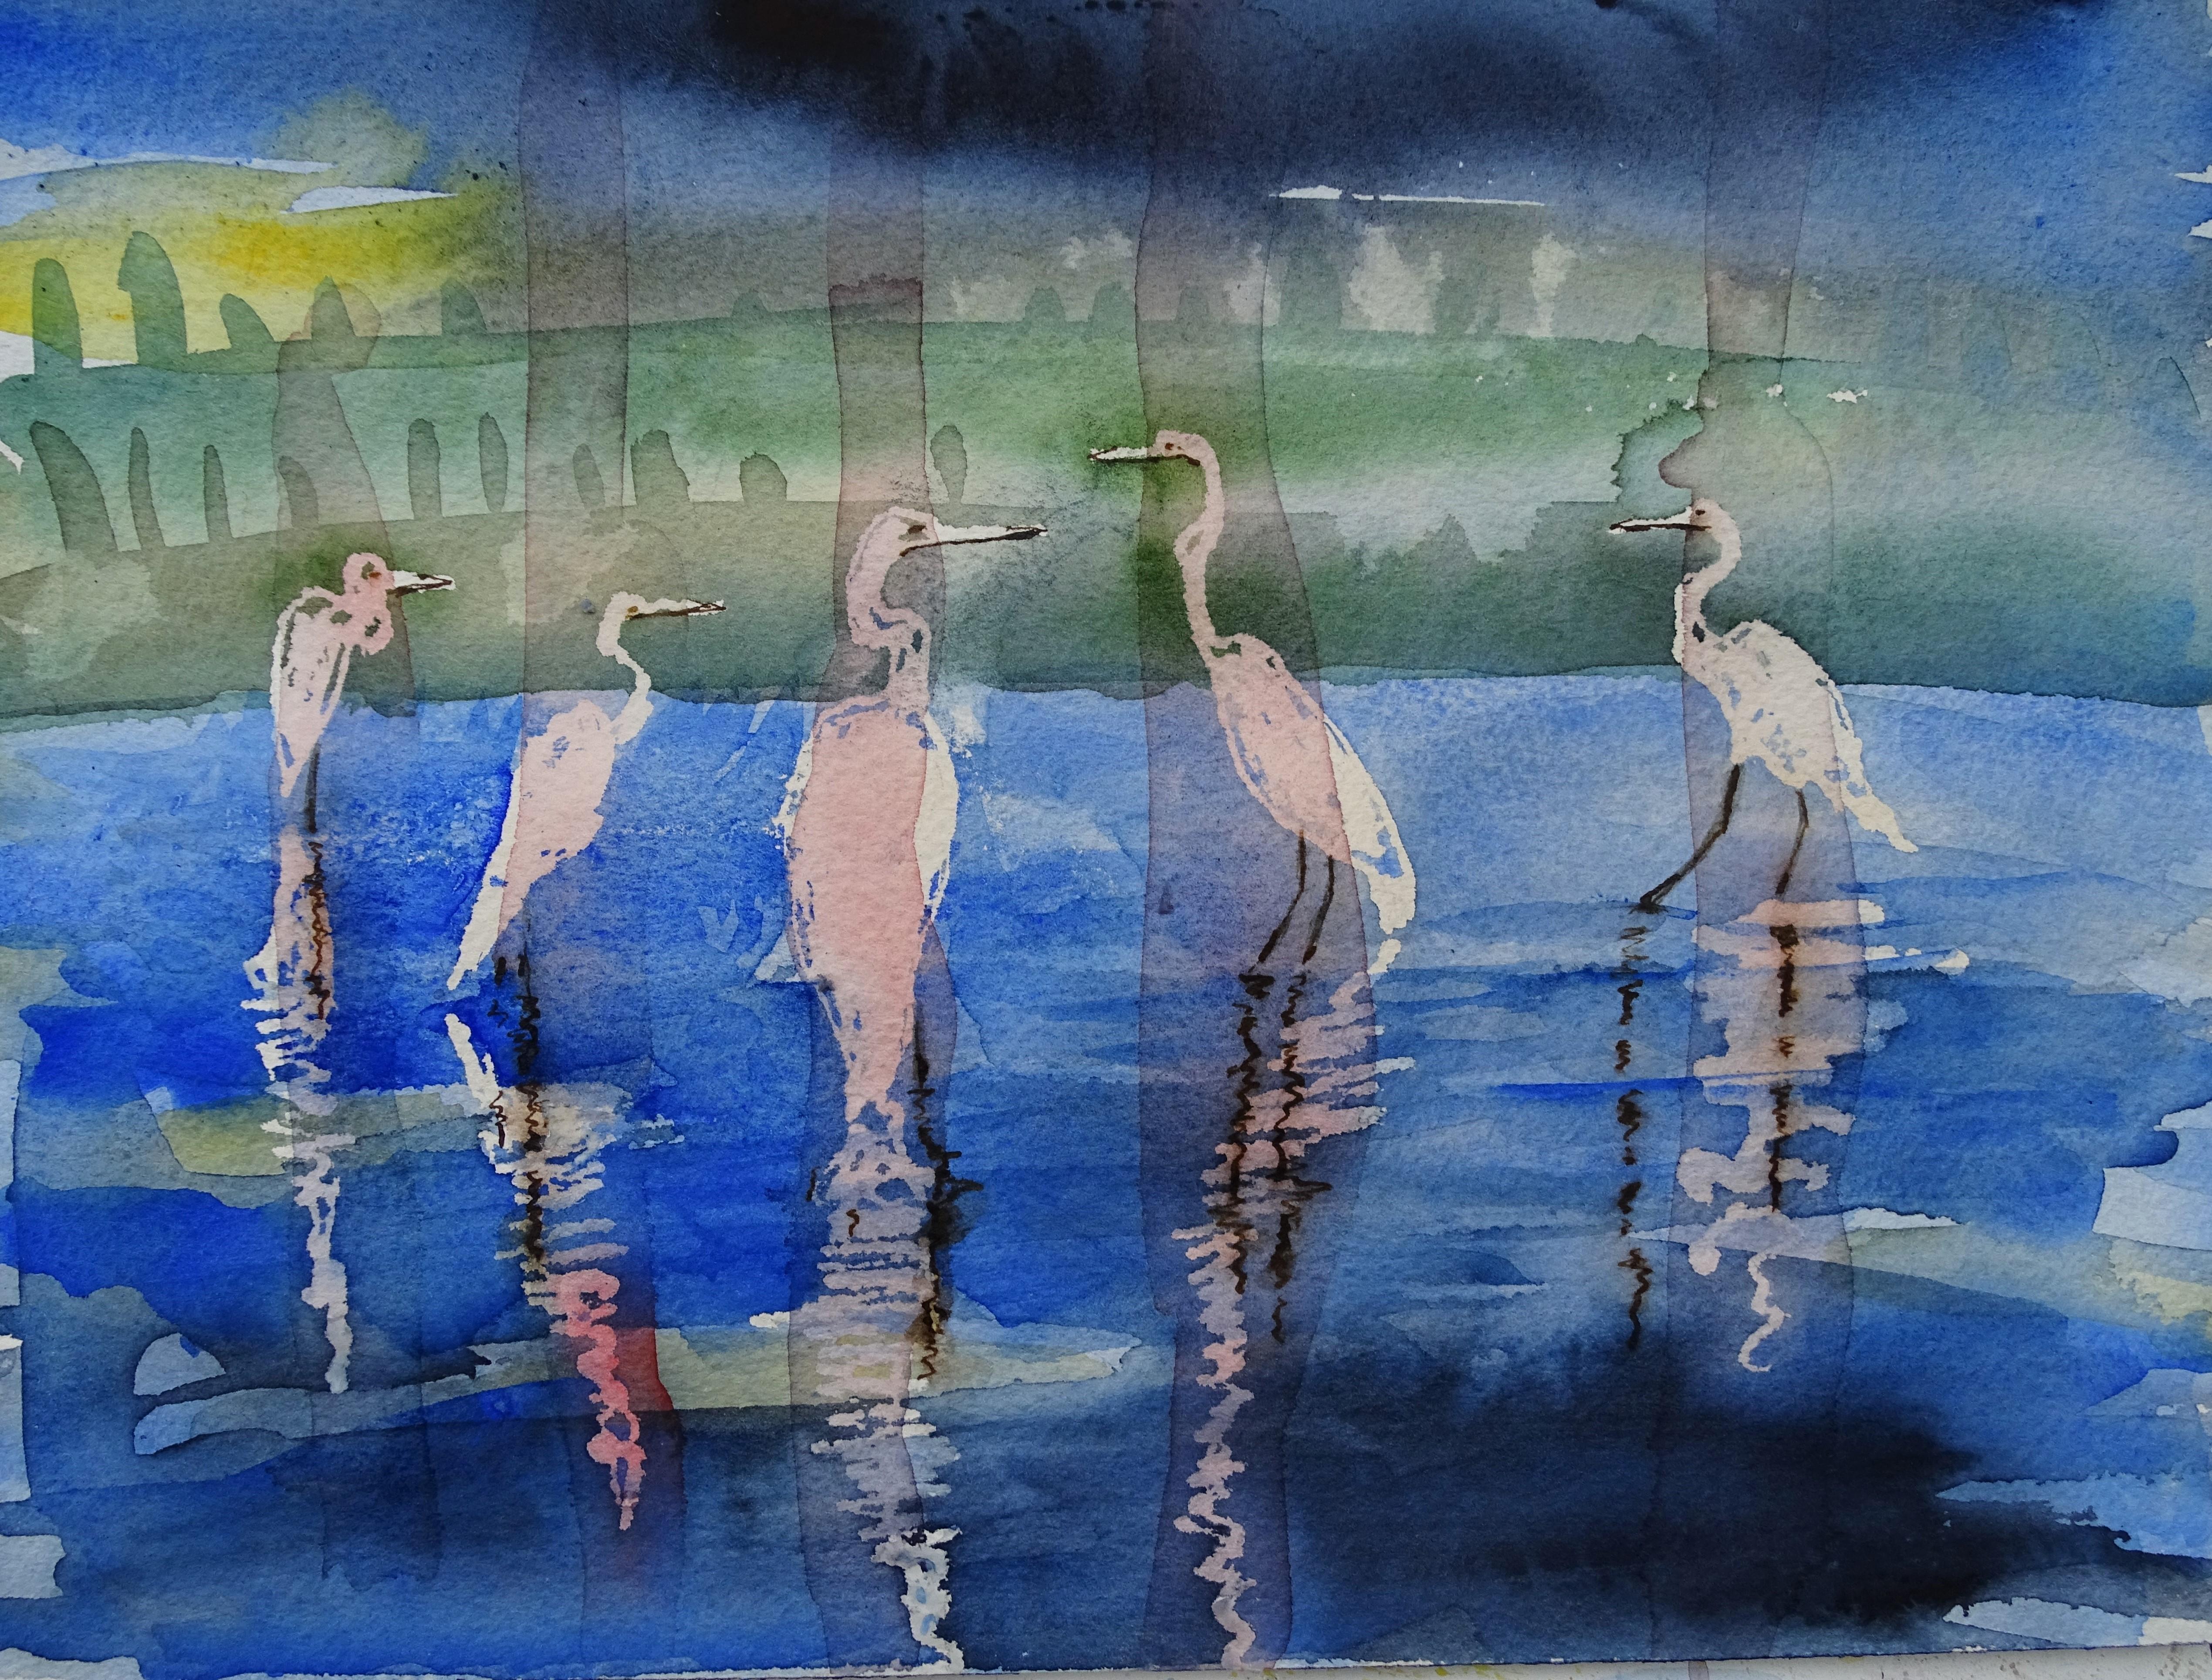 Reiher-Aquarell-Watercolour-Nadia-Baumgart